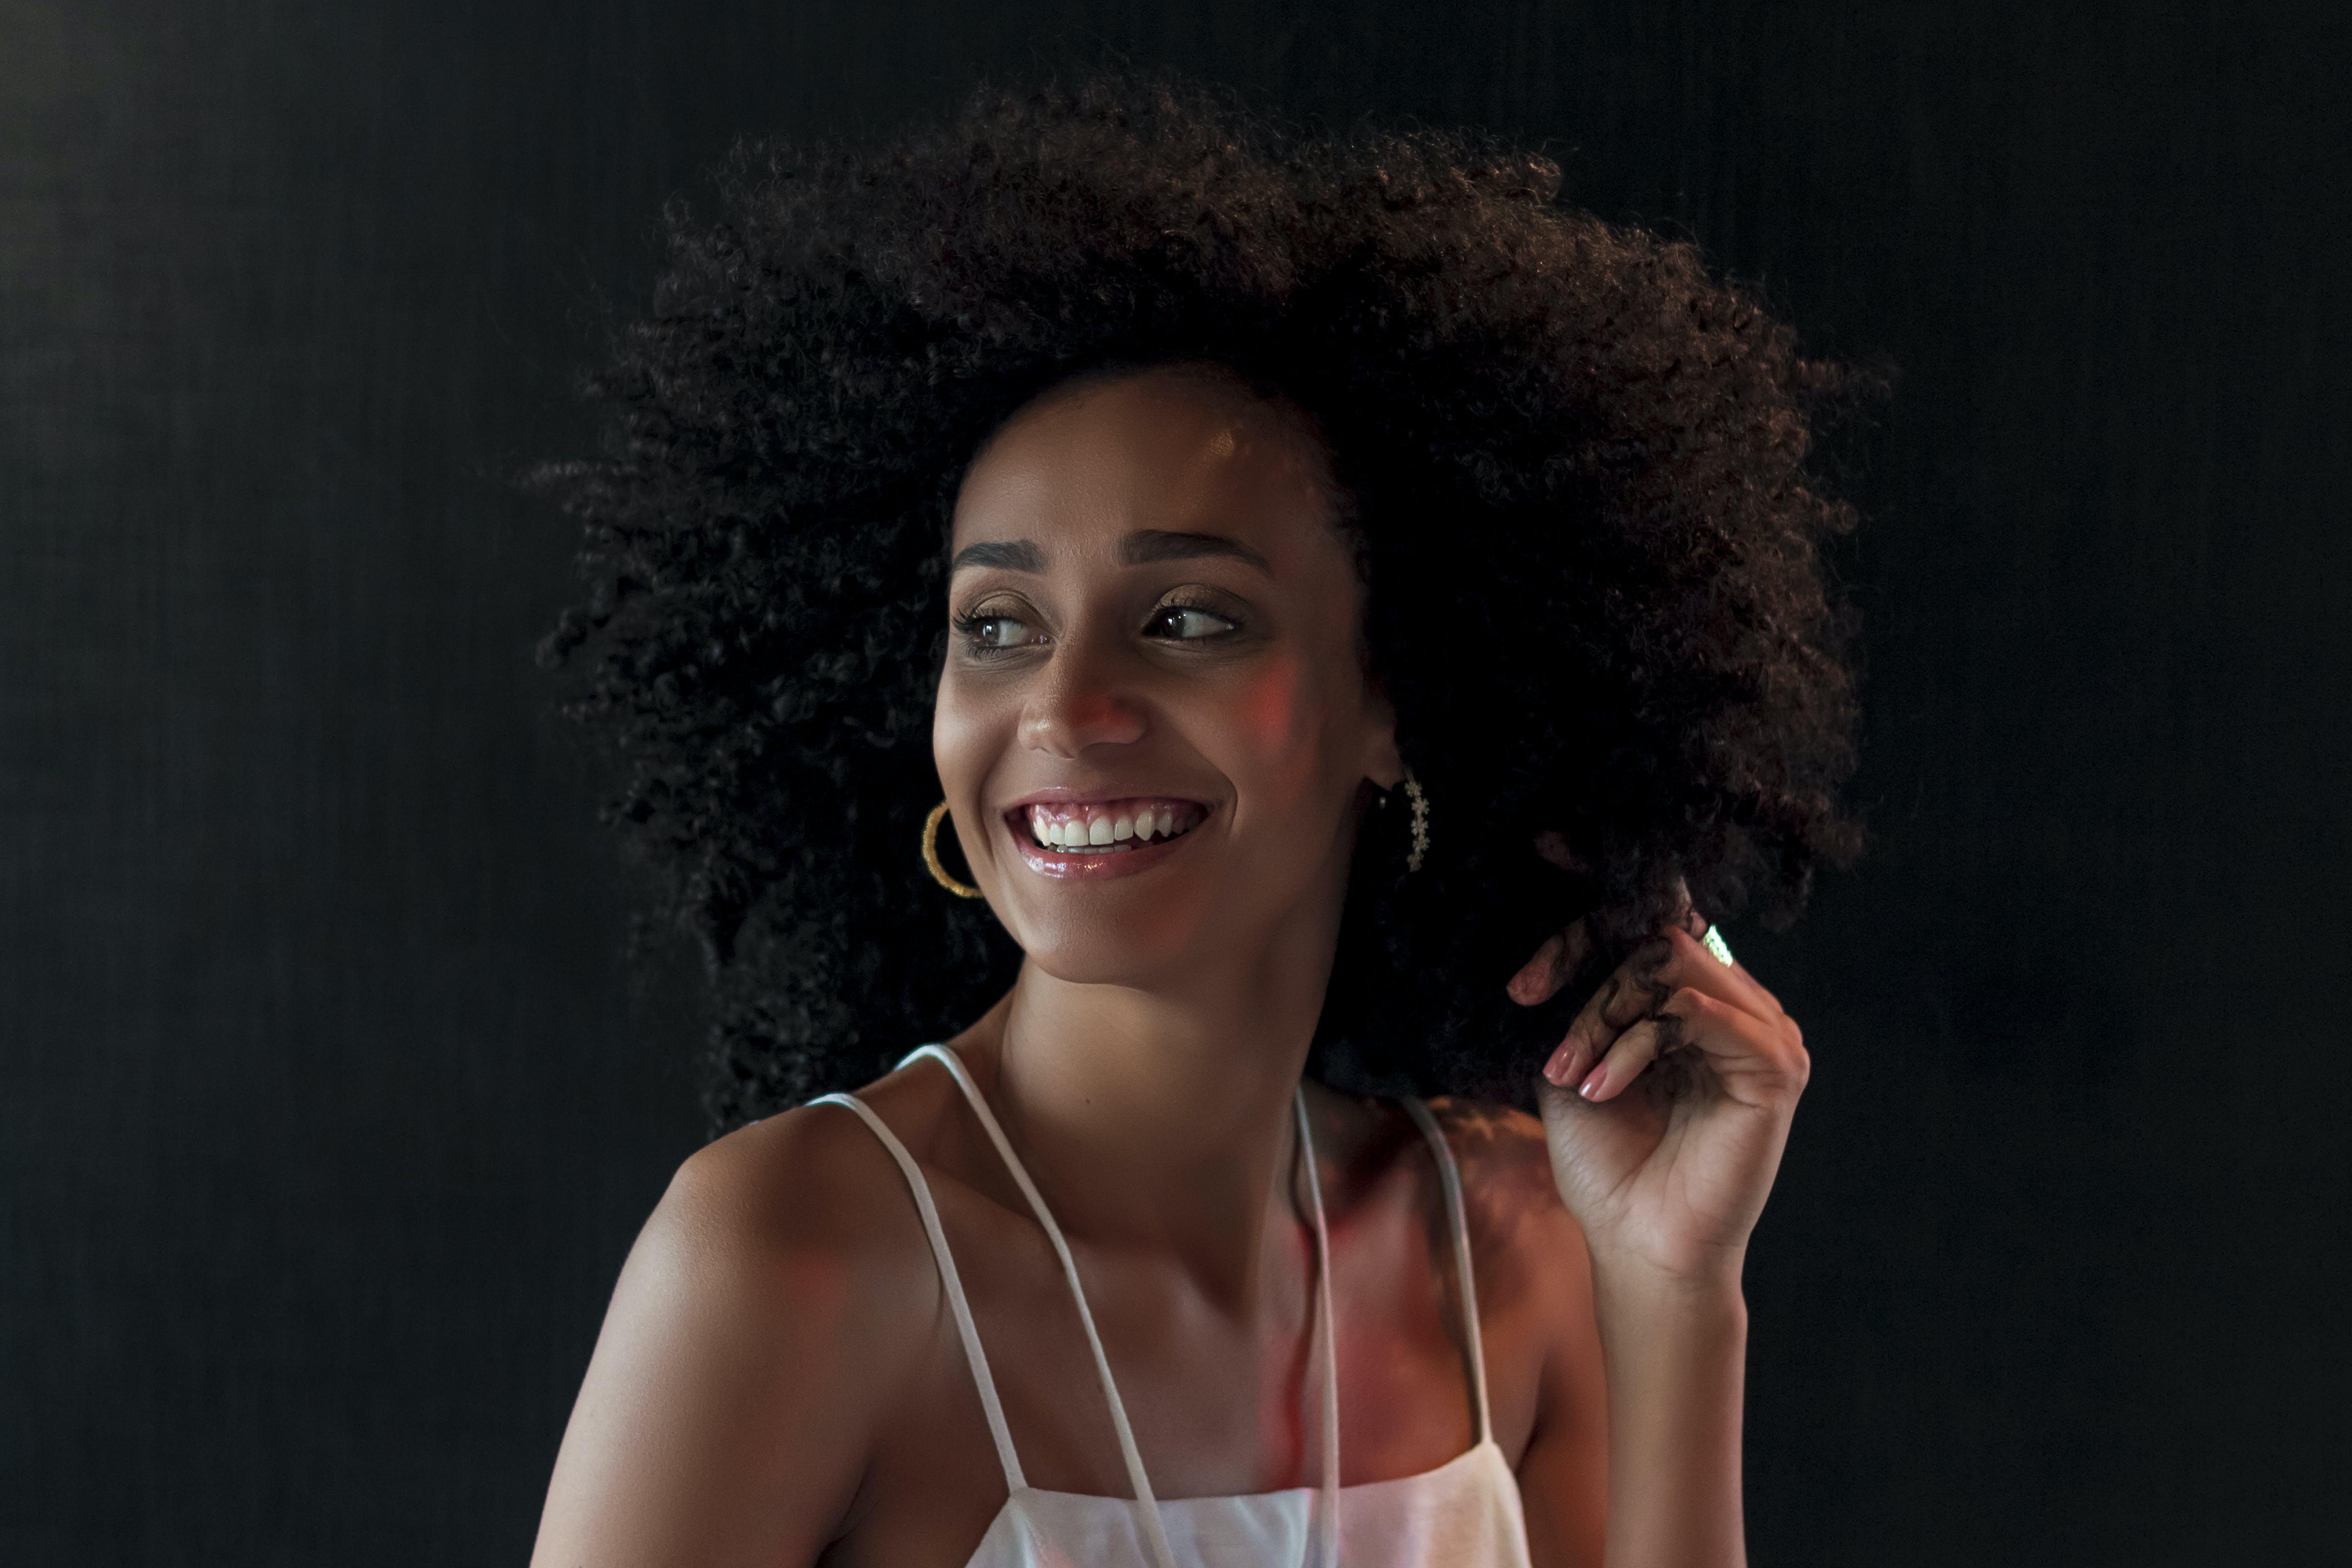 Smiling Woman in White Spaghetti Strap Top